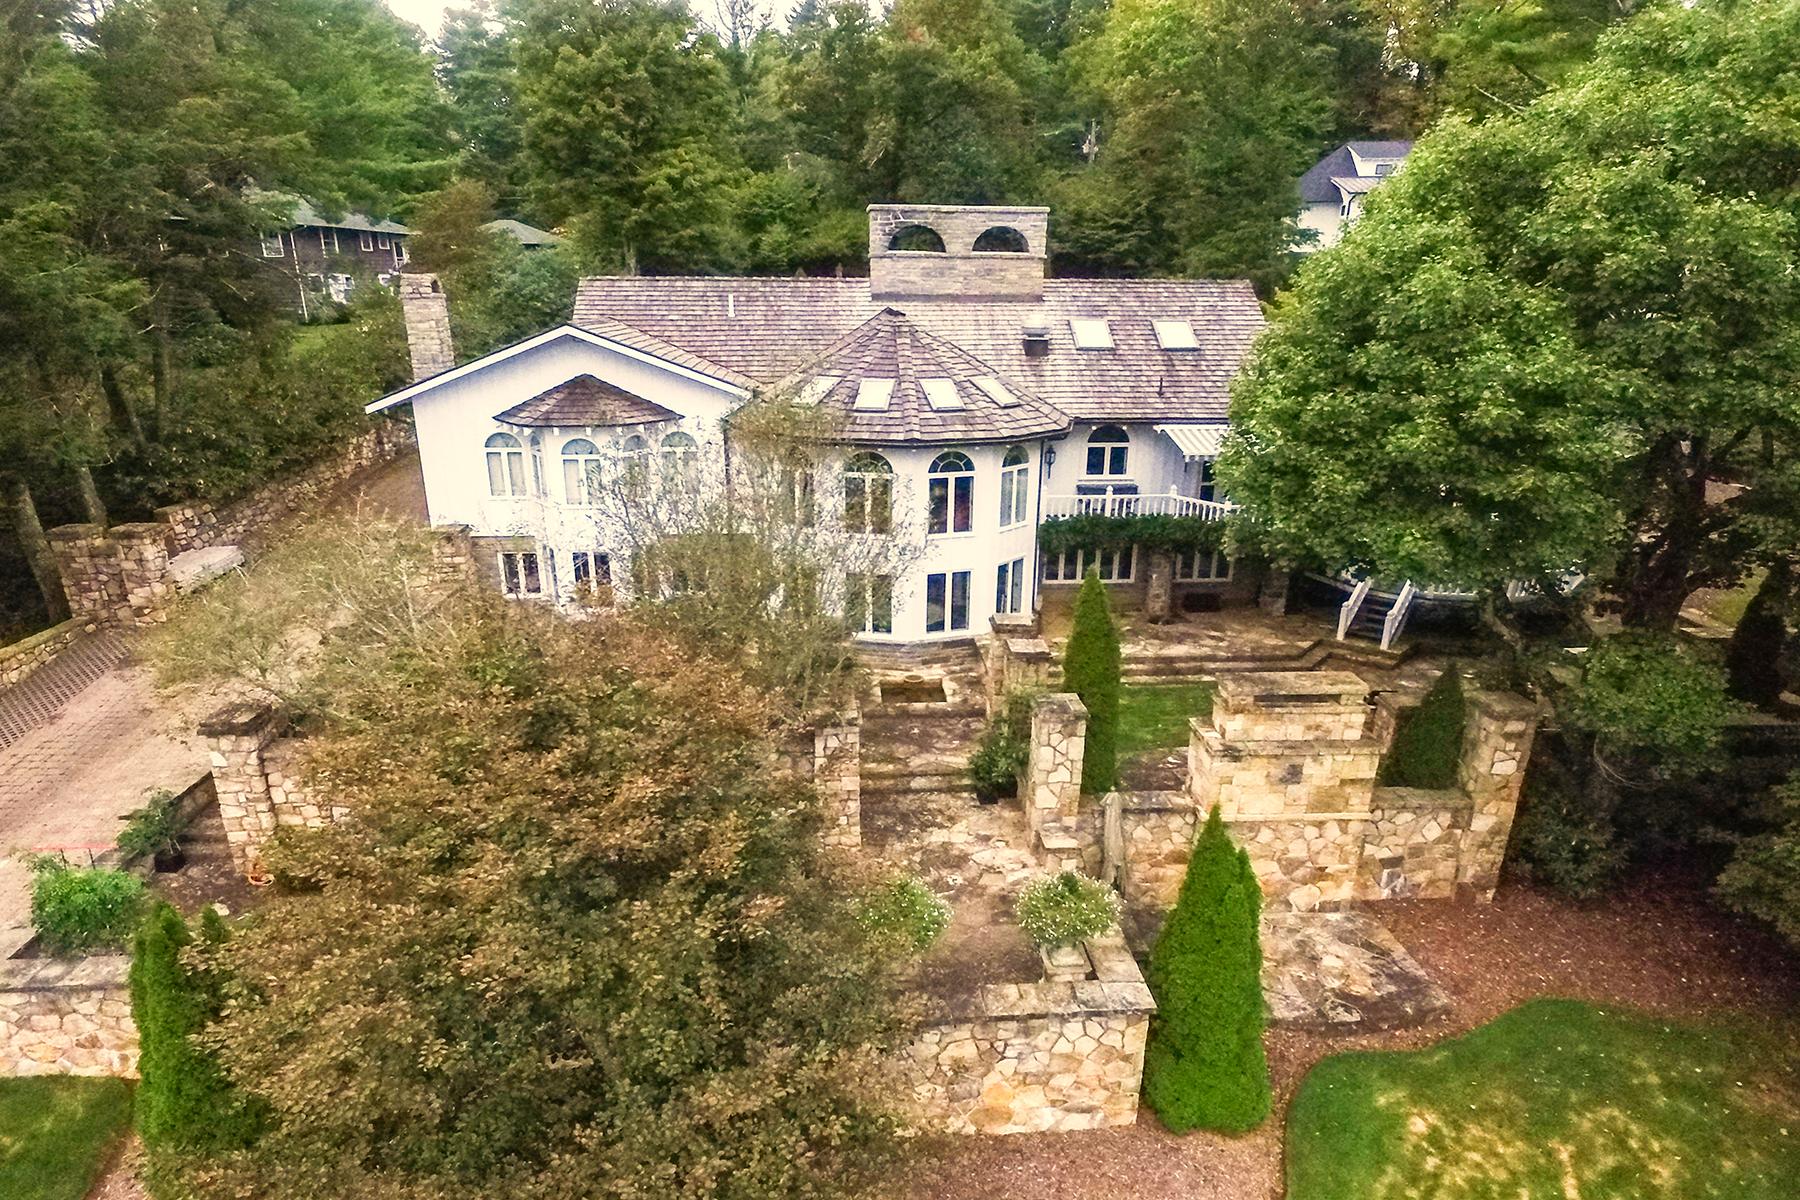 Villa per Vendita alle ore BLOWING ROCK - MAYVIEW PARK 727 Laurel Lane Blowing Rock, Carolina Del Nord, 28605 Stati Uniti